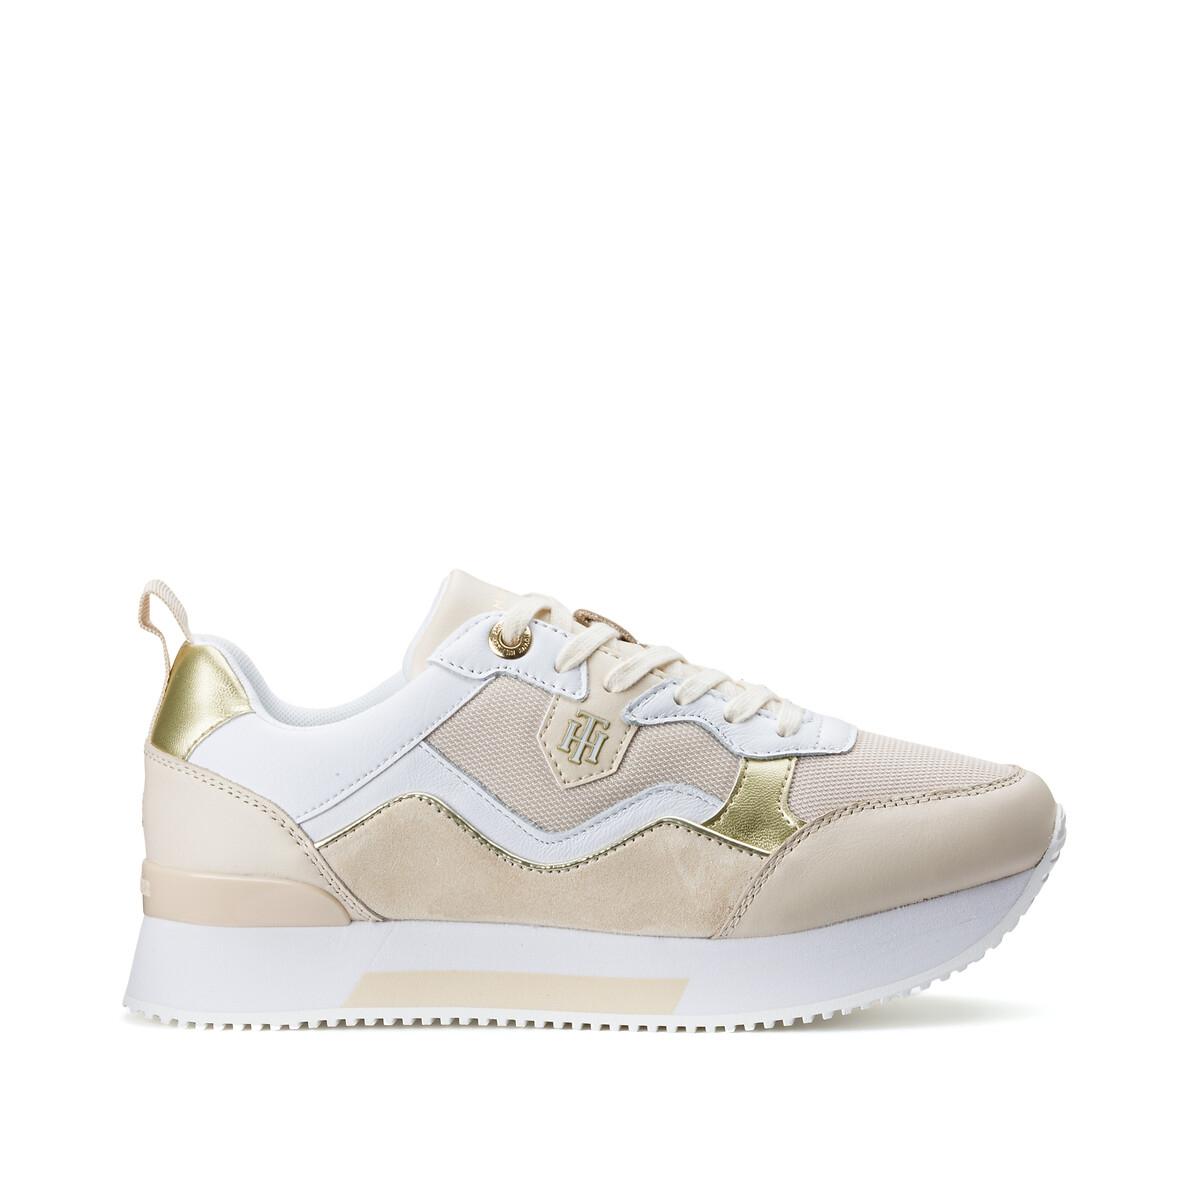 Tommy Hilfiger Material Mix Active City sneakers beige/wit/goud online kopen